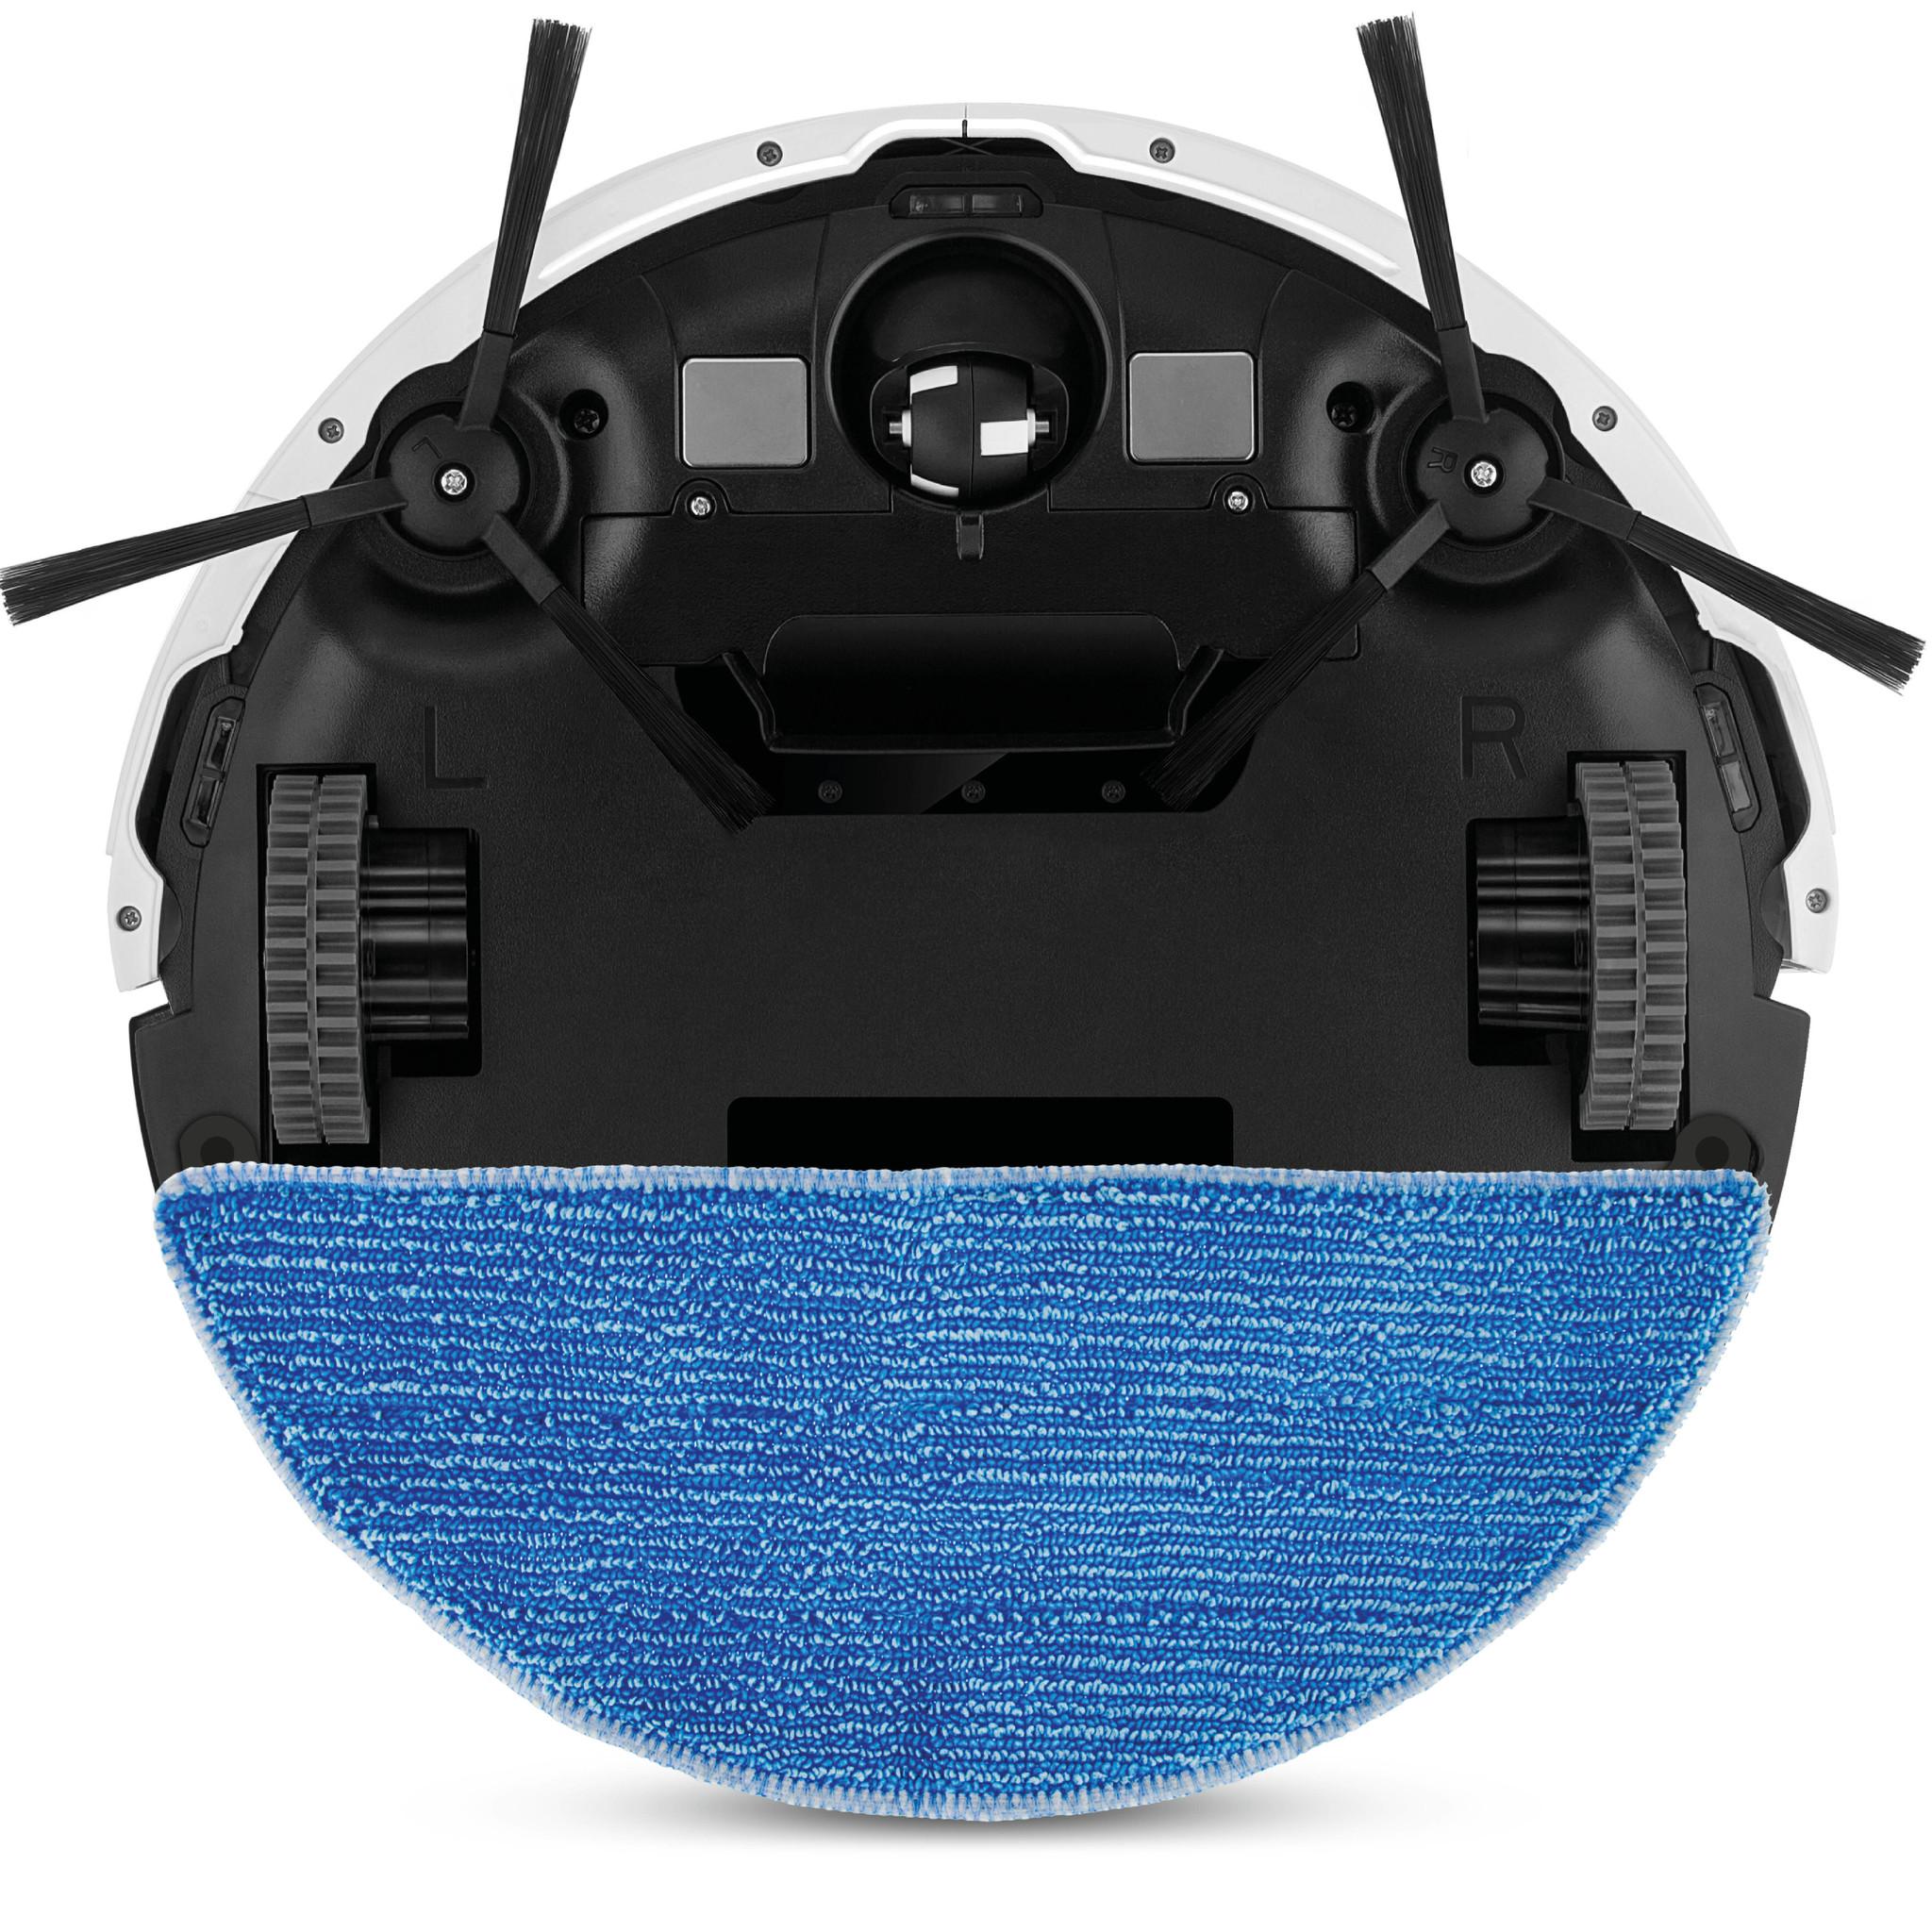 ZACO iLife V5s pro– Робот прахосмукачка с моп, 850 Pa